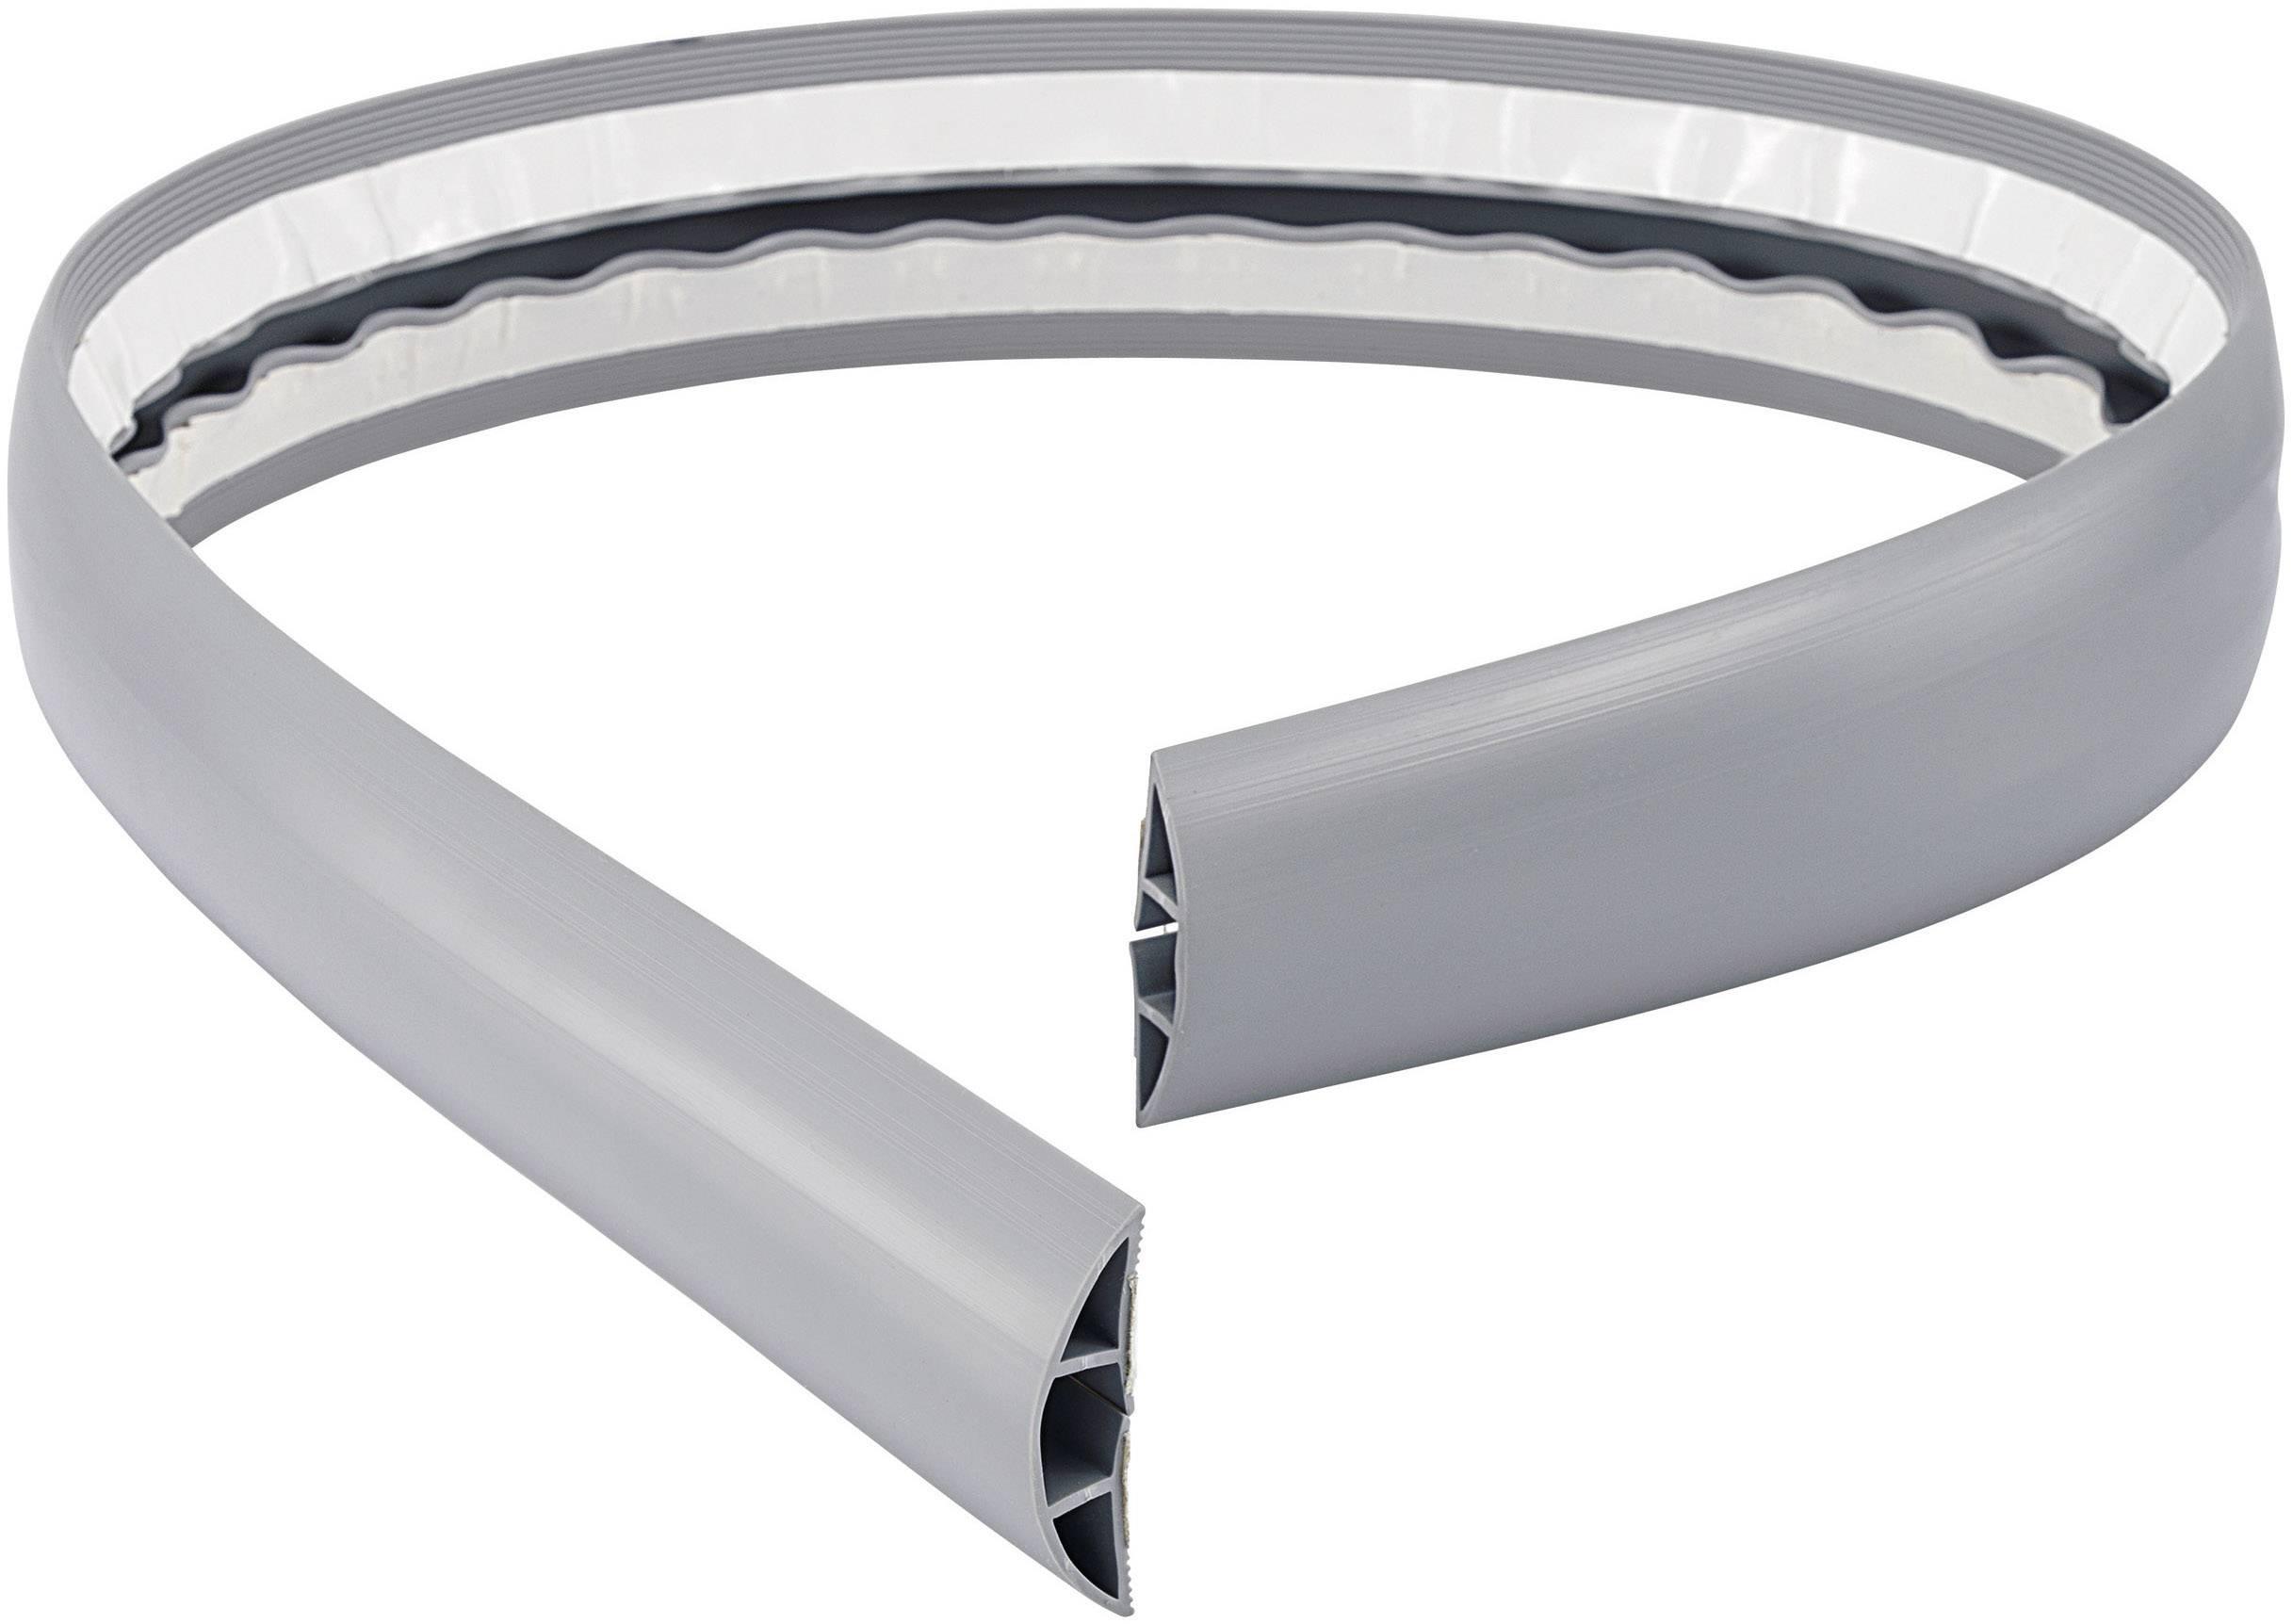 Káblový mostík TRU COMPONENTS 1566306 (d x š) 1800 mm x 50.8 mm, sivá, 1 ks